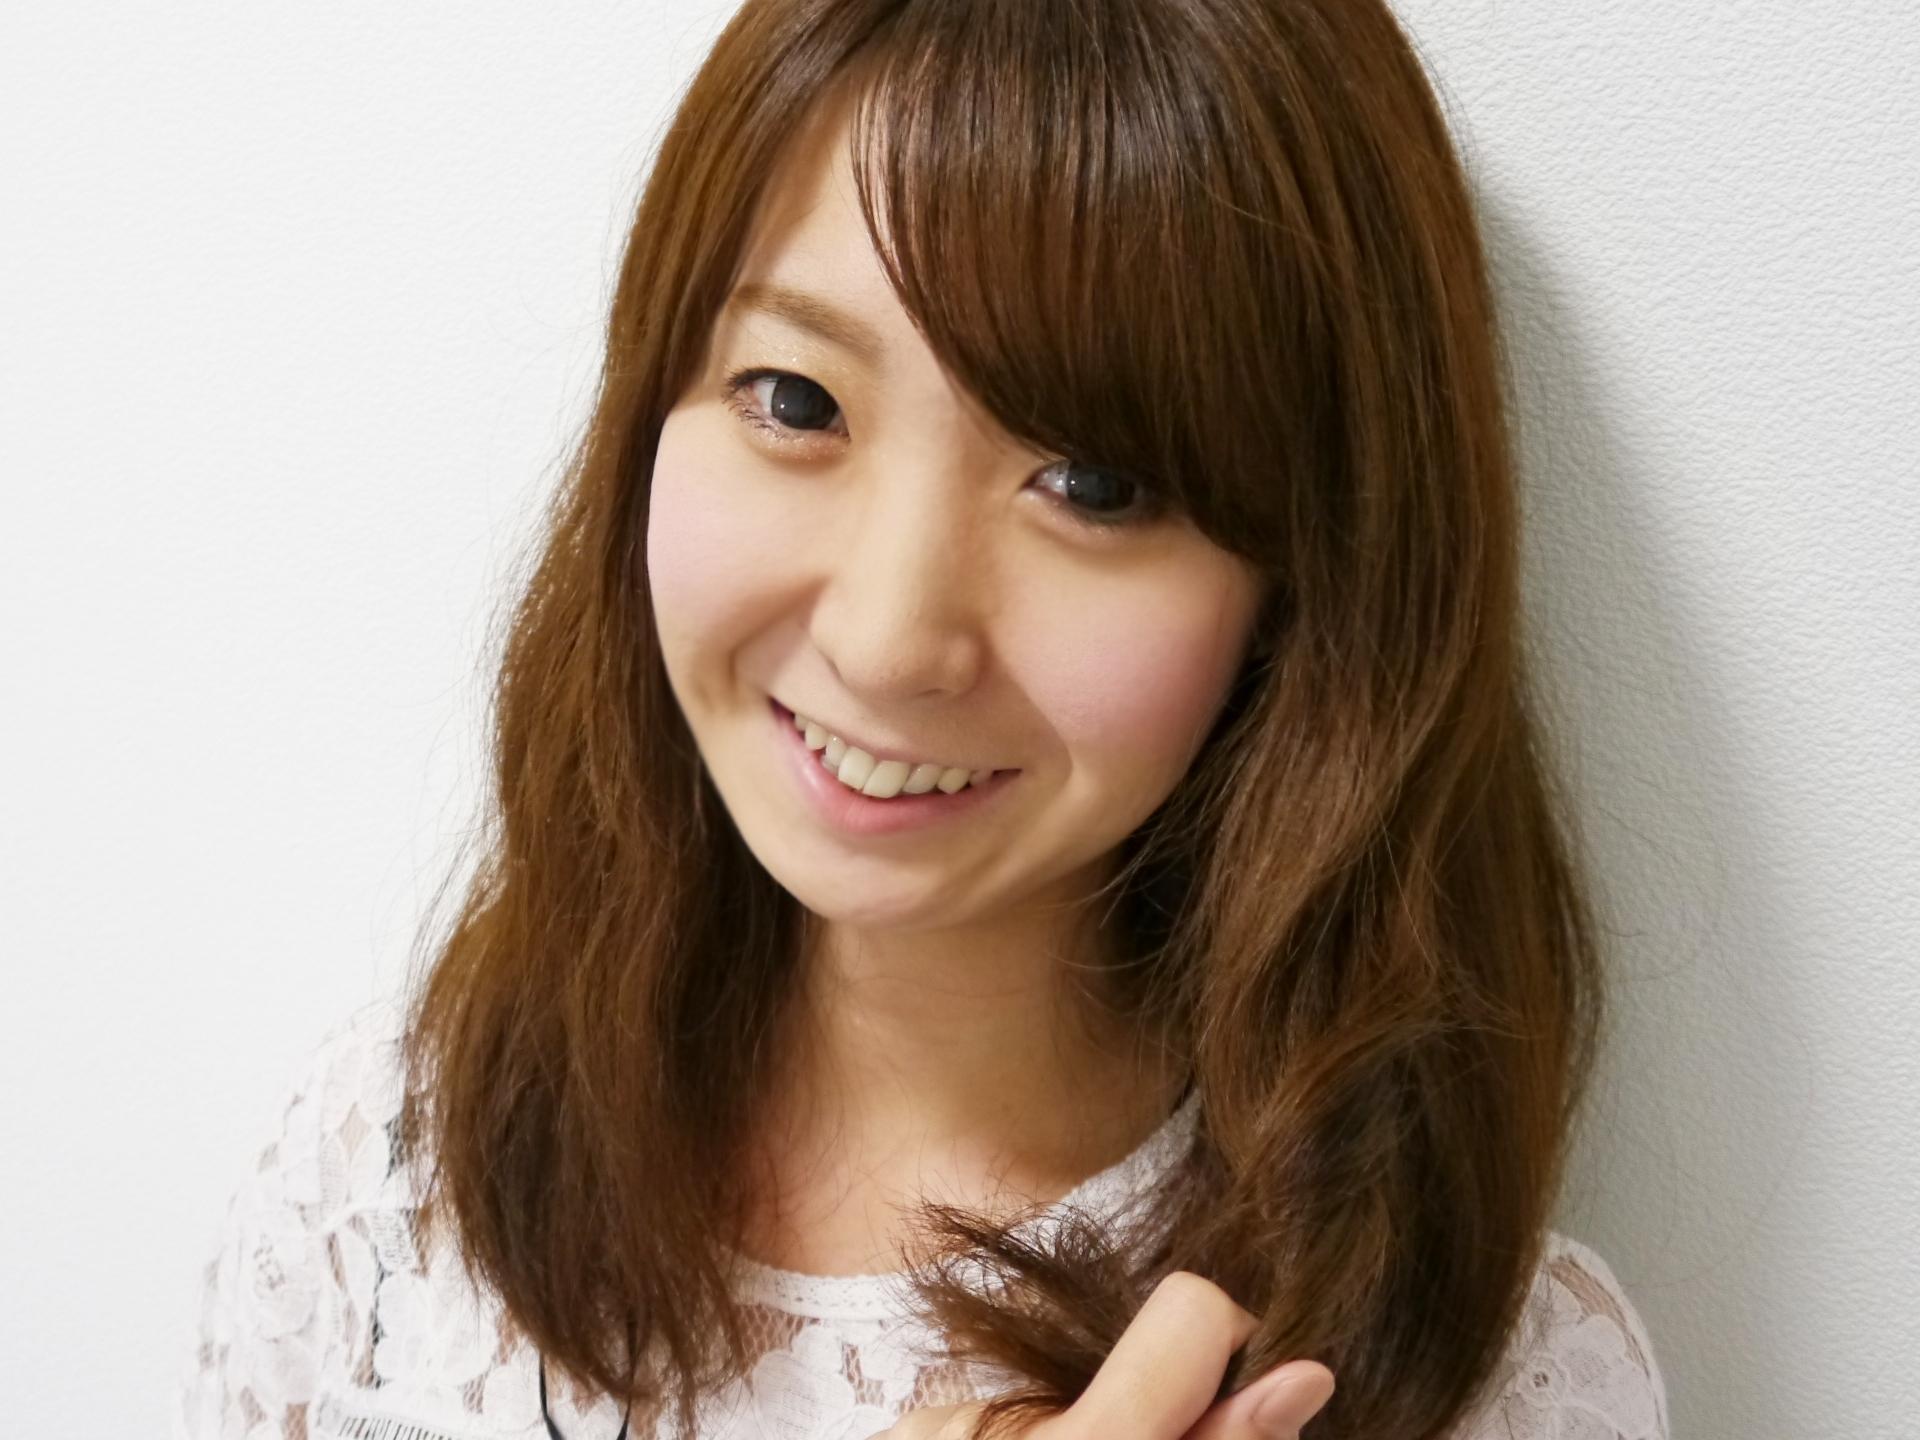 sySAKI - Japanese webcam girl